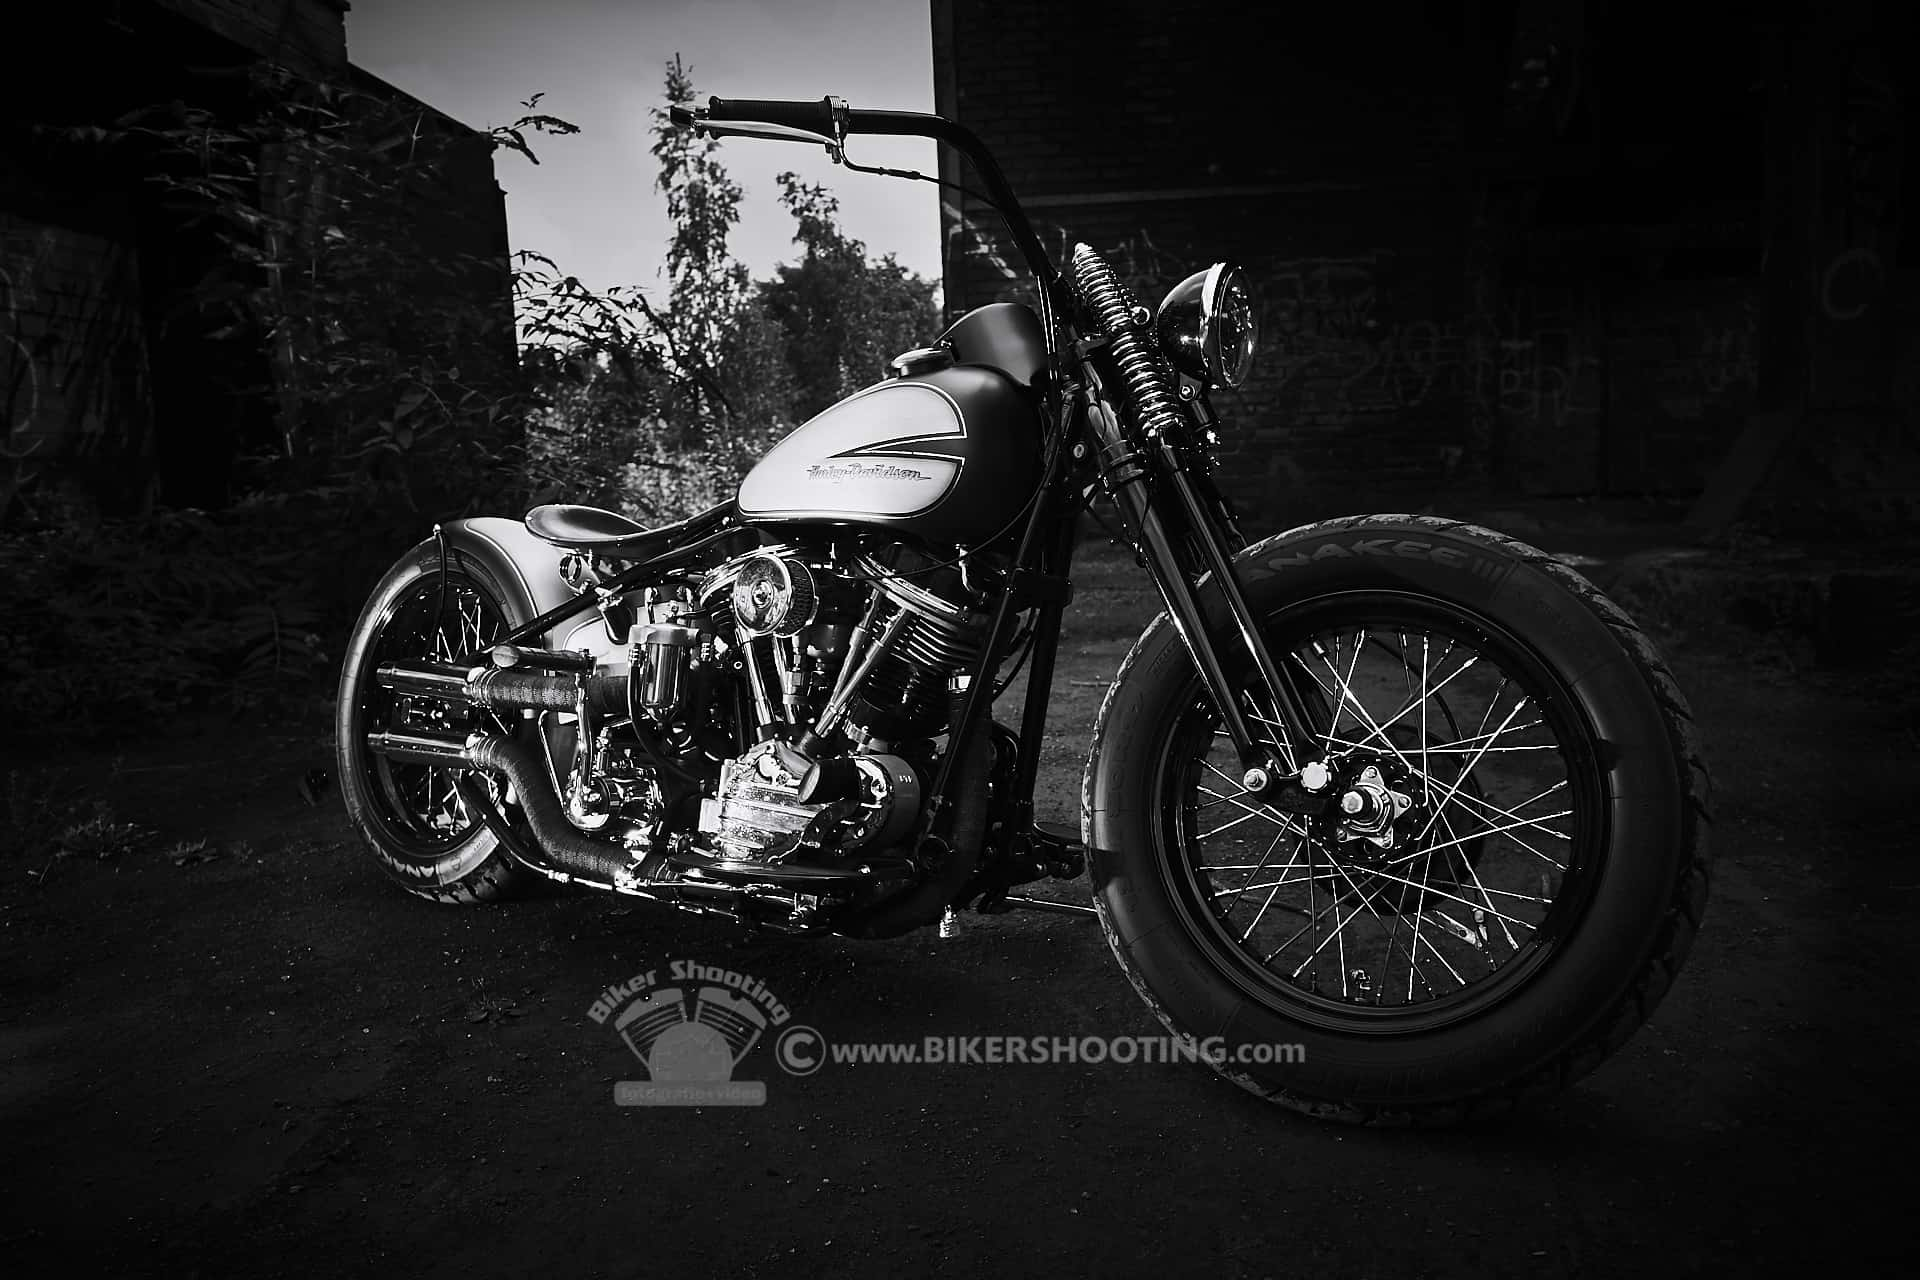 Biker Fotoshooting SPECIAL Fotoshooting motorrad shooting, biker fotoshooting, fotoshooting mit motorrad, fotoshooting motorrad, motorrad fotoshooting